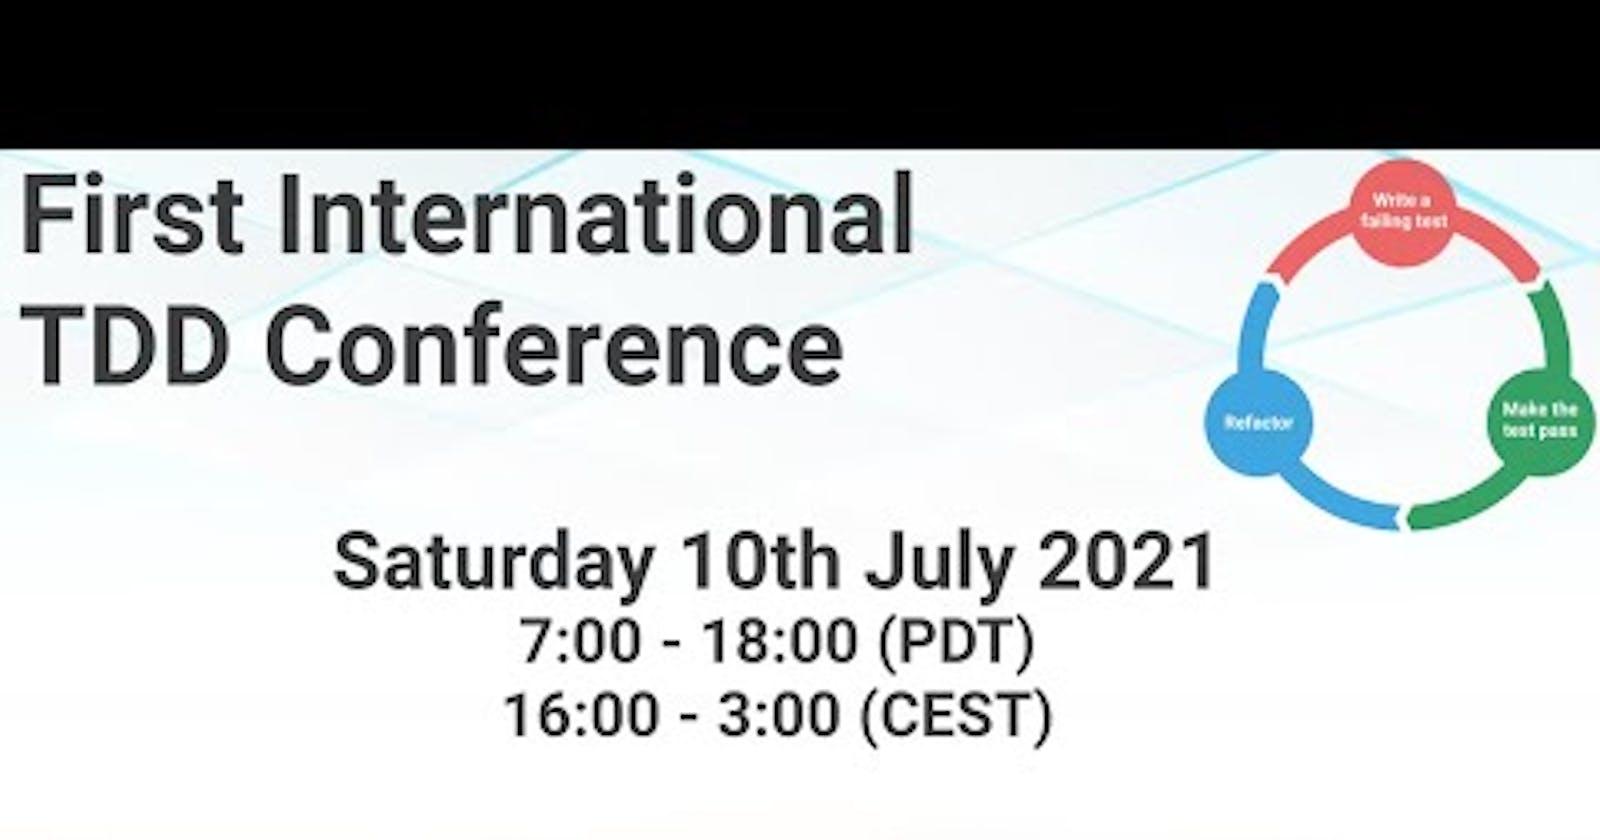 TDD Conference 2021 - Opening Ceremony by Alex Bunardzic